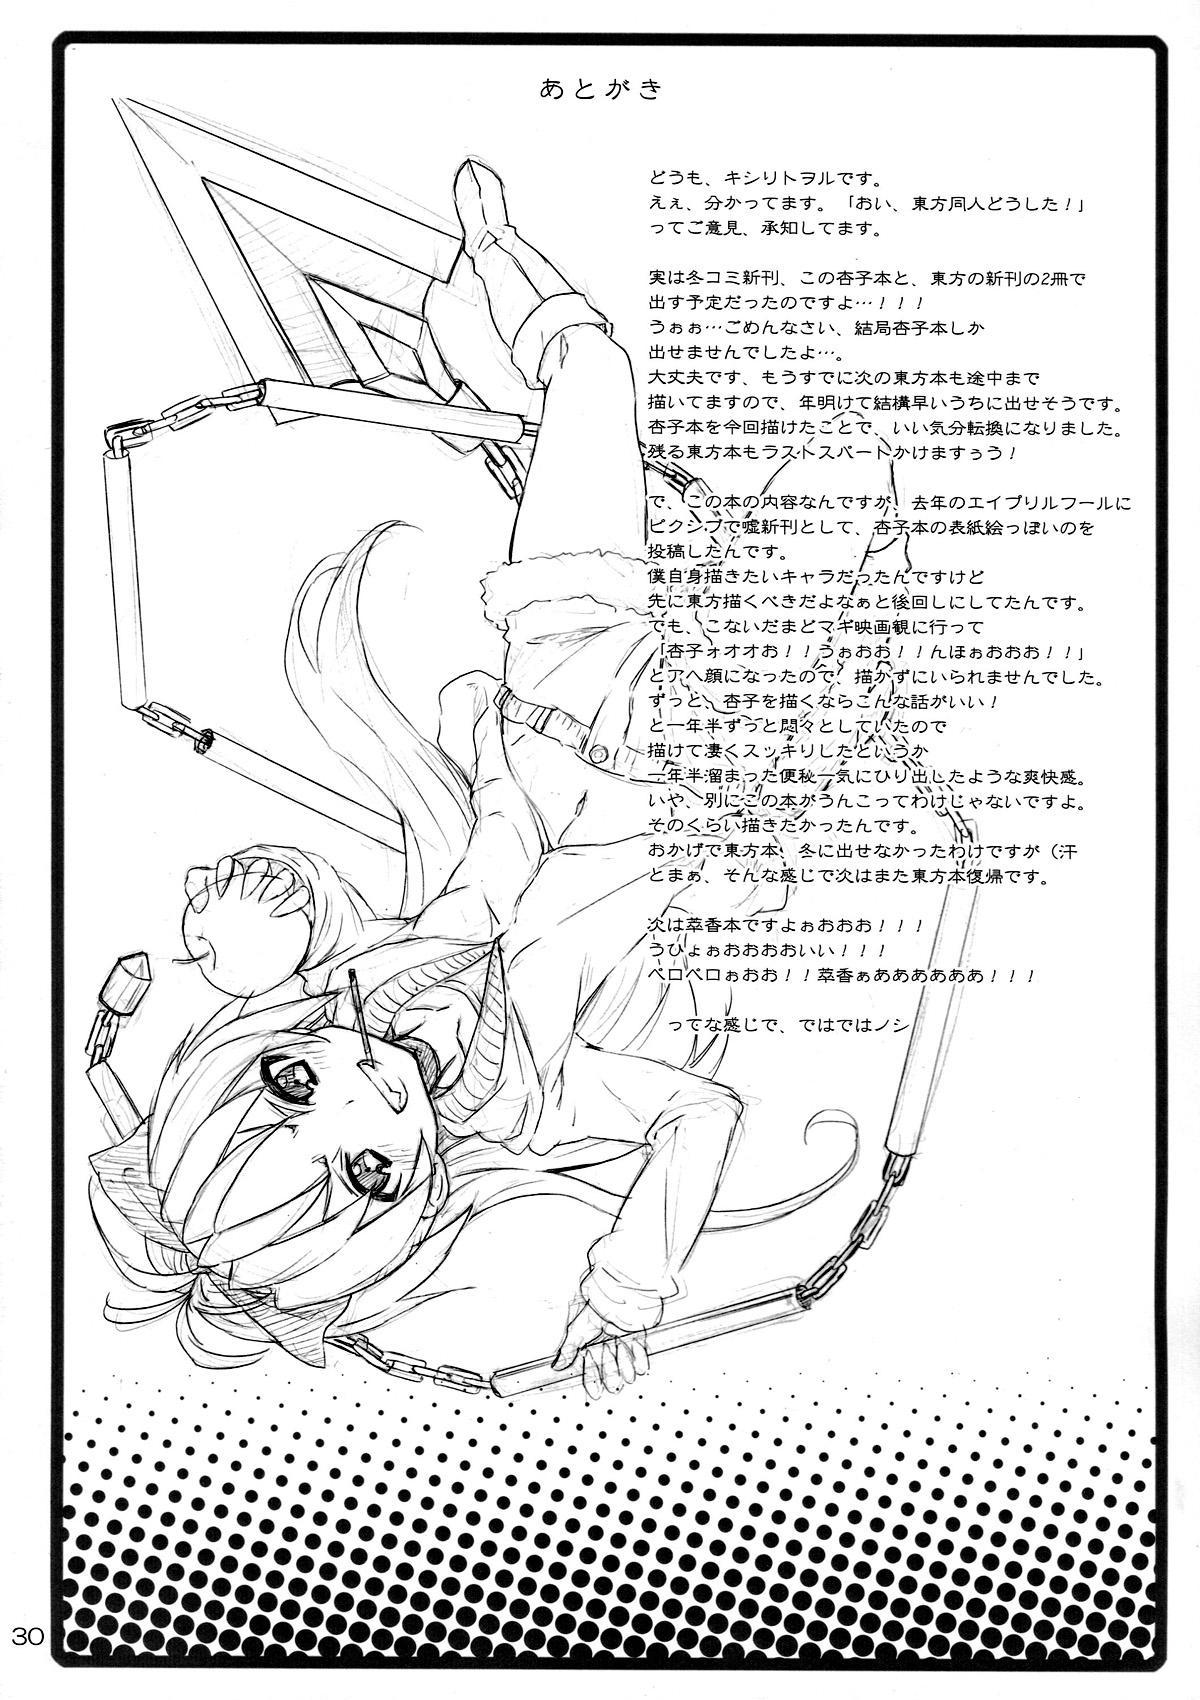 Kyouko to Itoshi no Bakayarou | Kyouko and Her Beloved Idiot 28